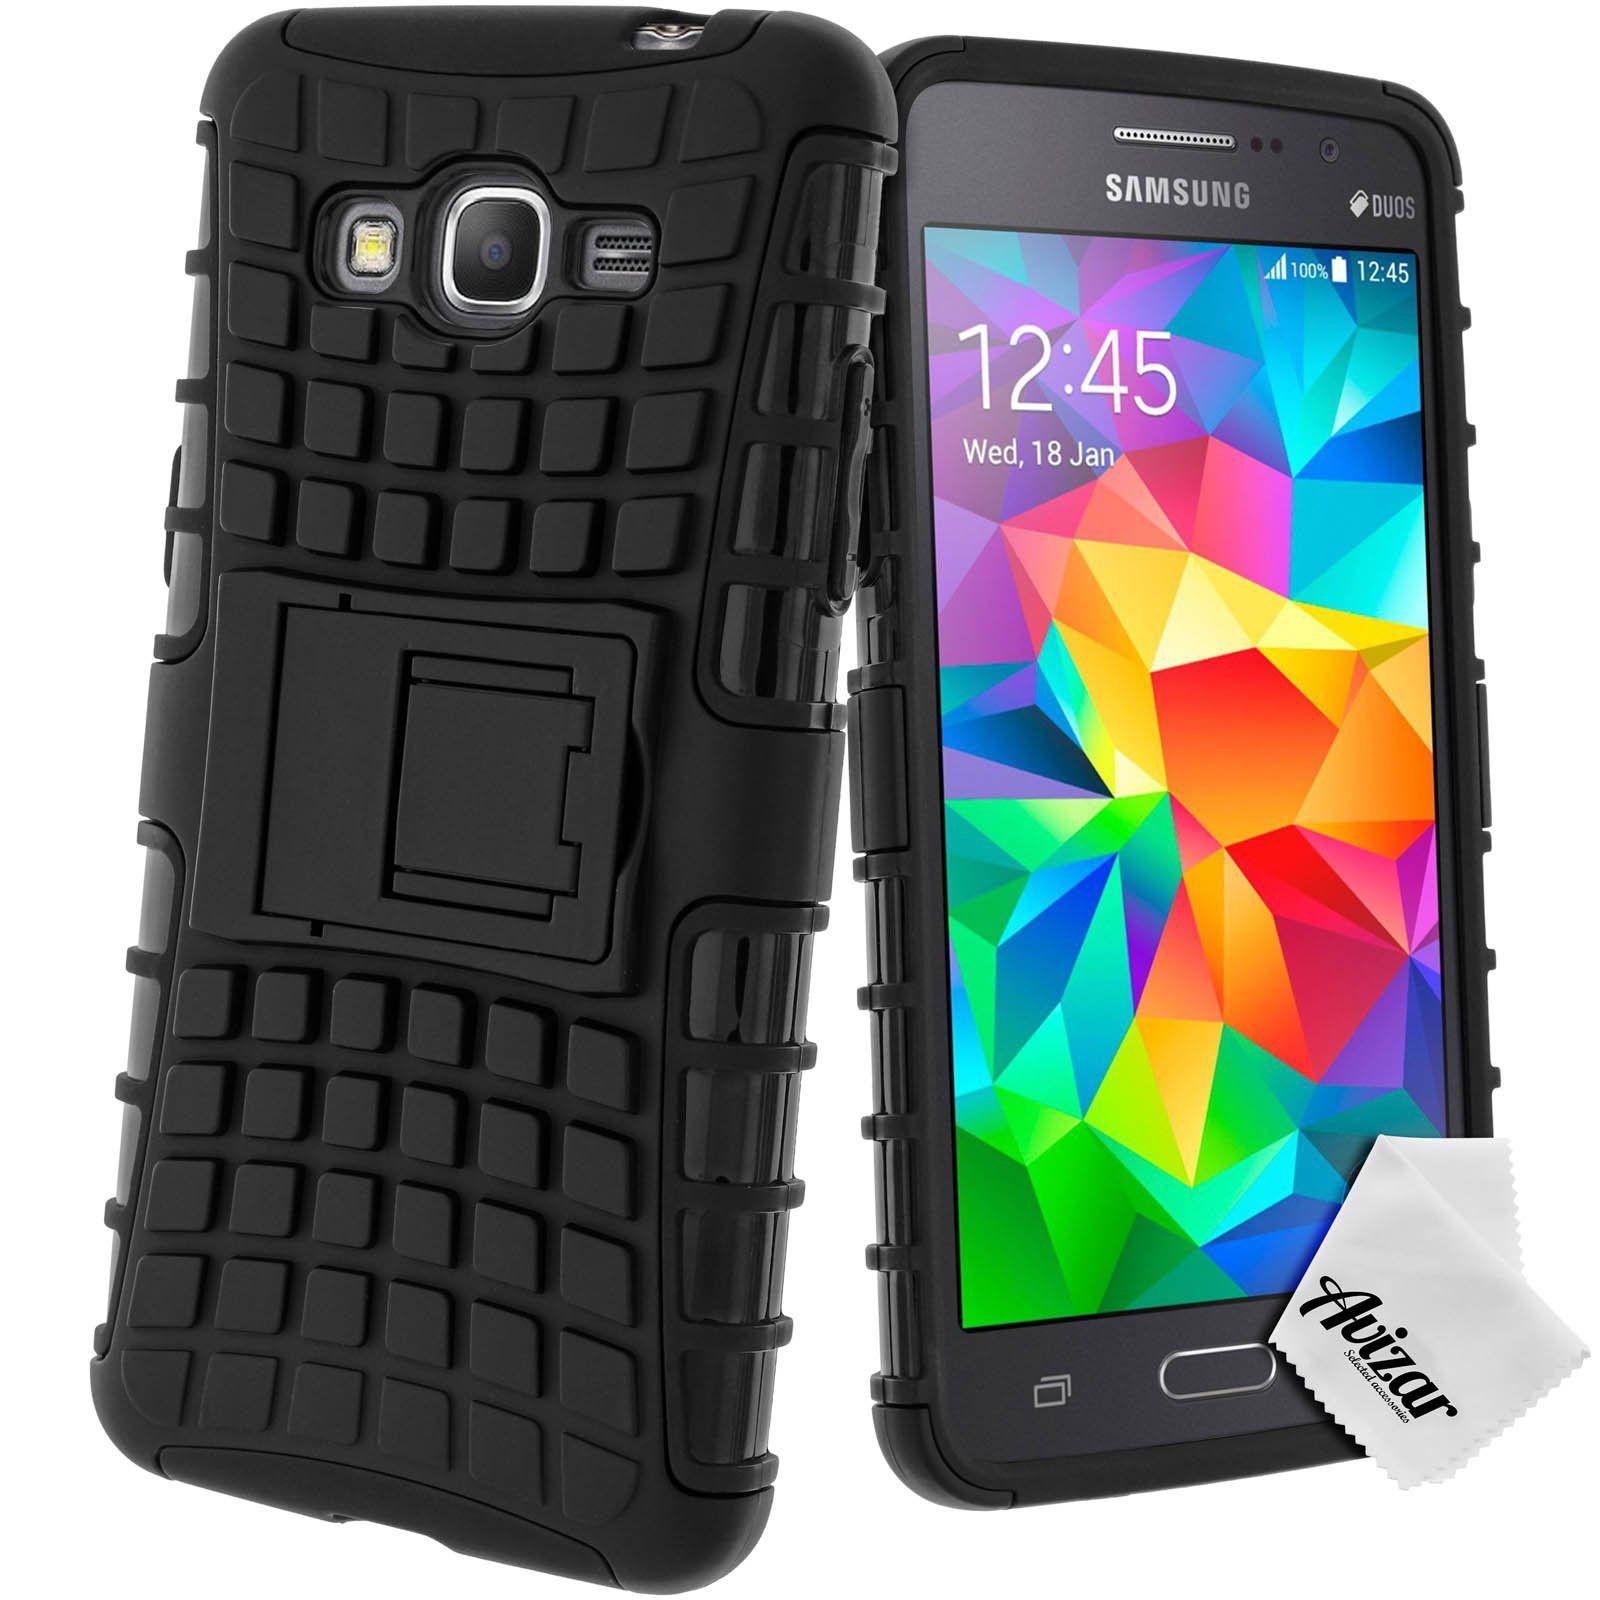 Avizar Coque Protection Antichocs pour Samsung Galaxy Grand Prime Bimati¨re Noir